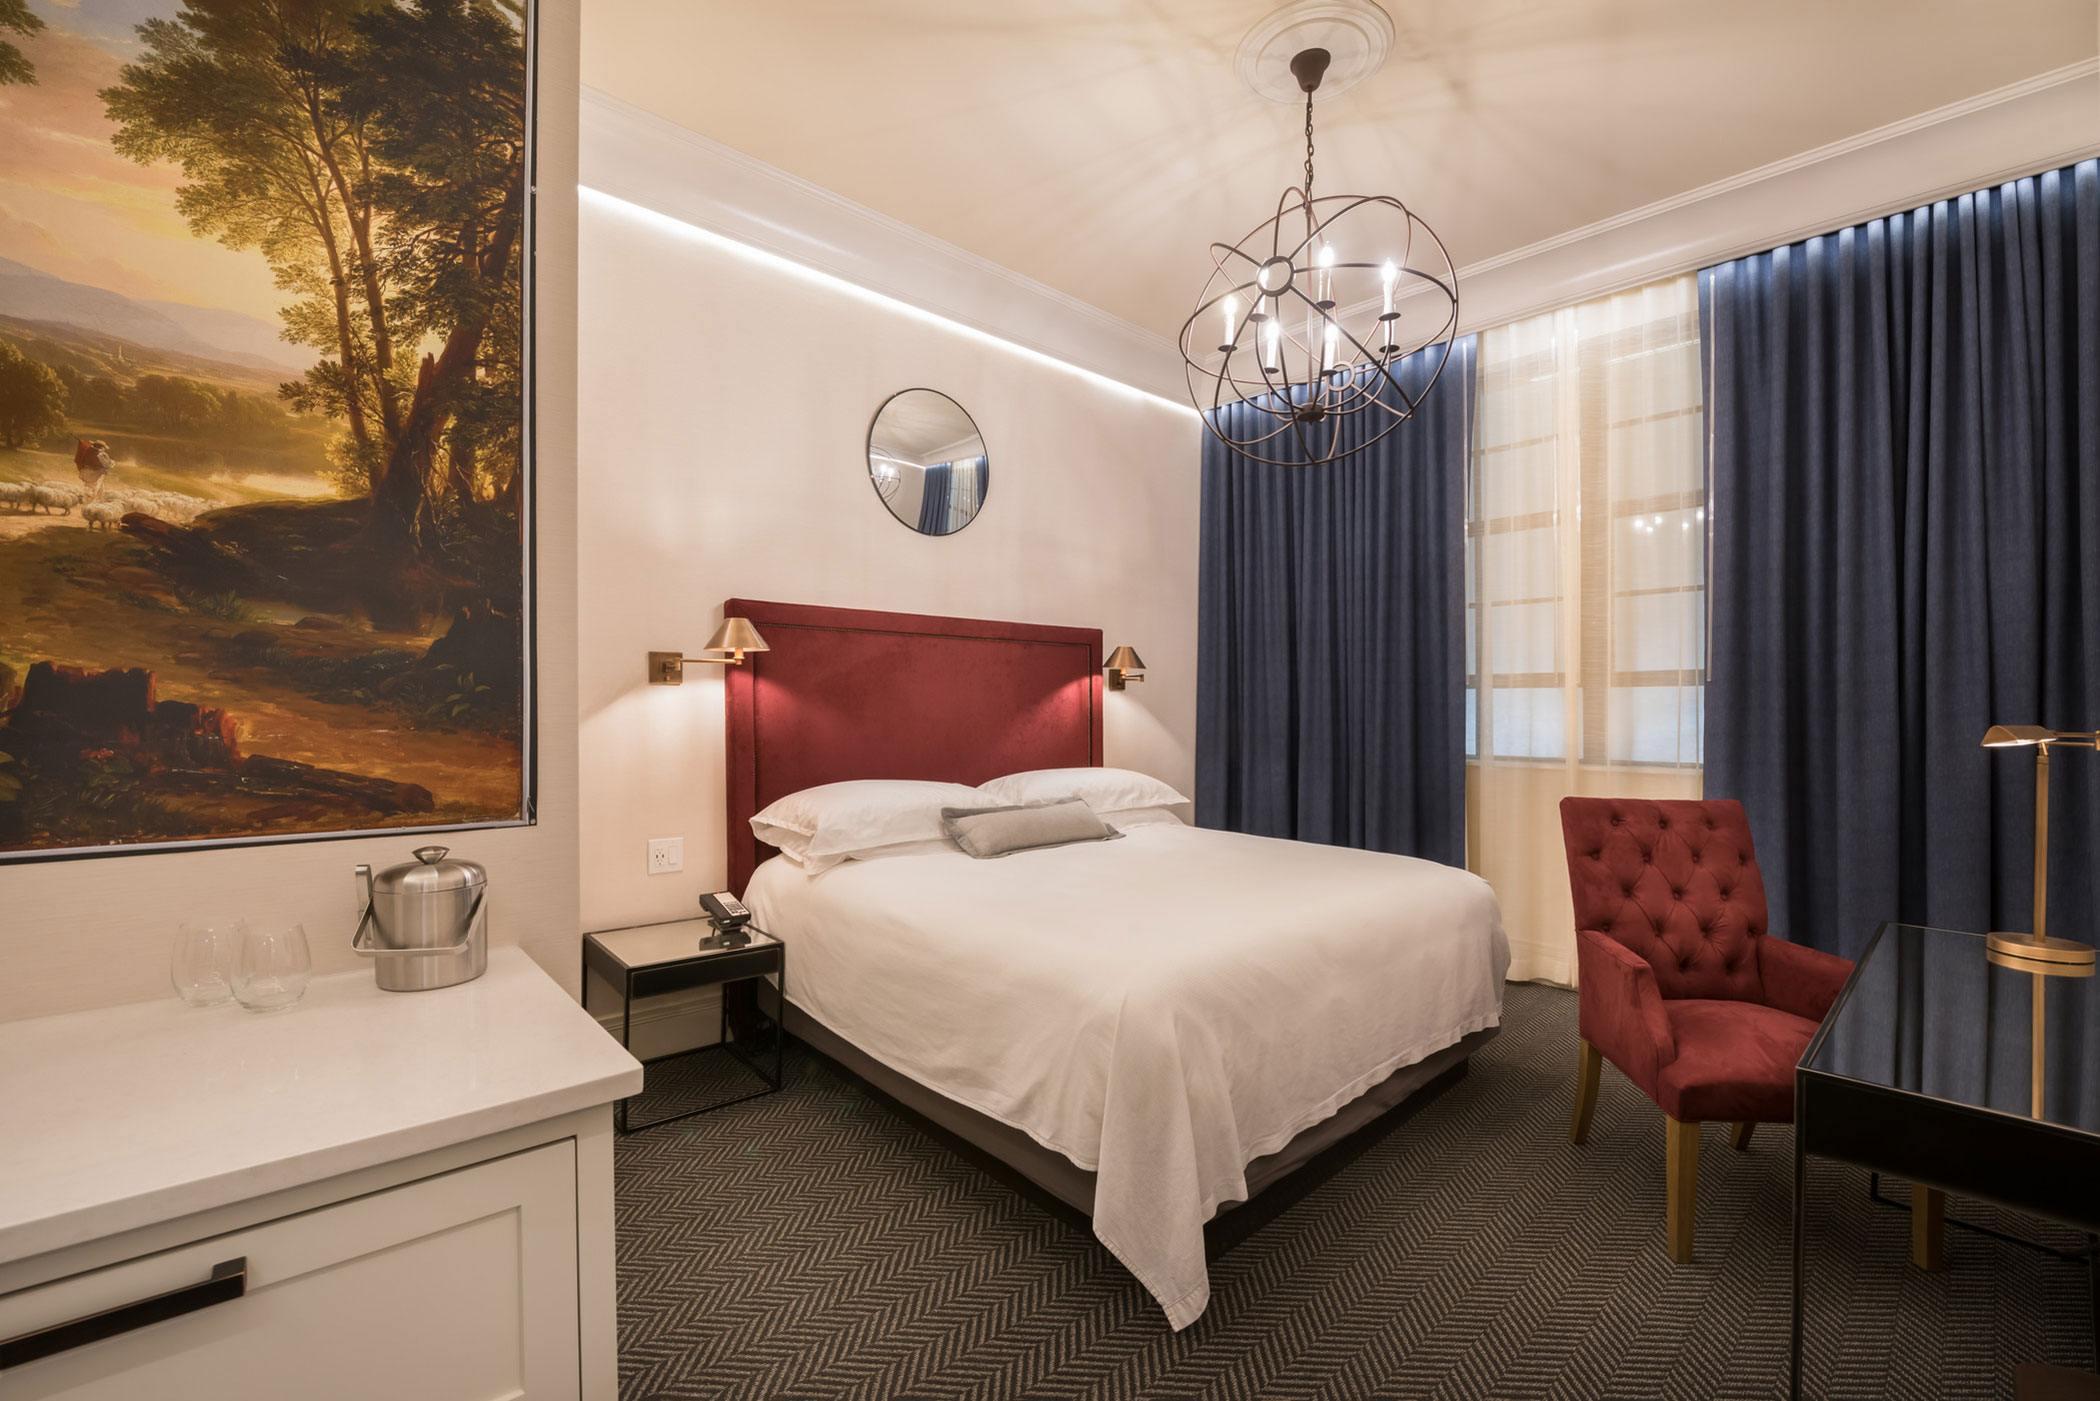 the-wick-hotel-tribute-portfolio-p4742gr-219171-Guestroom—Rendering-Med